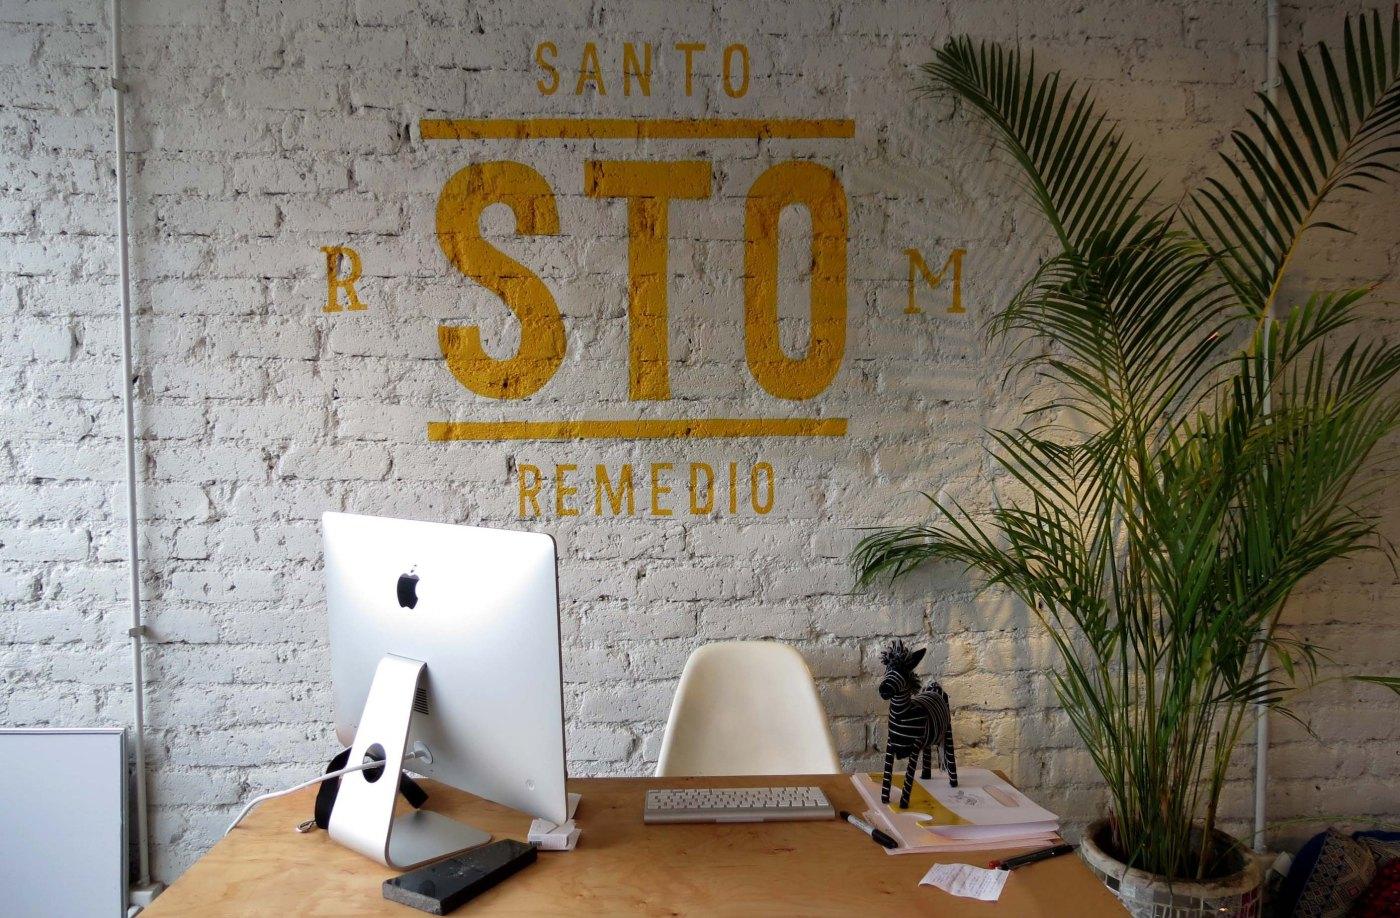 Santo Remedio, dignificando nuestras raíces, Hilando Historias blog, San Juan Chamula, Chiapas, handmade, artisan, artisan design, diseño artesanal, diseño mexicano